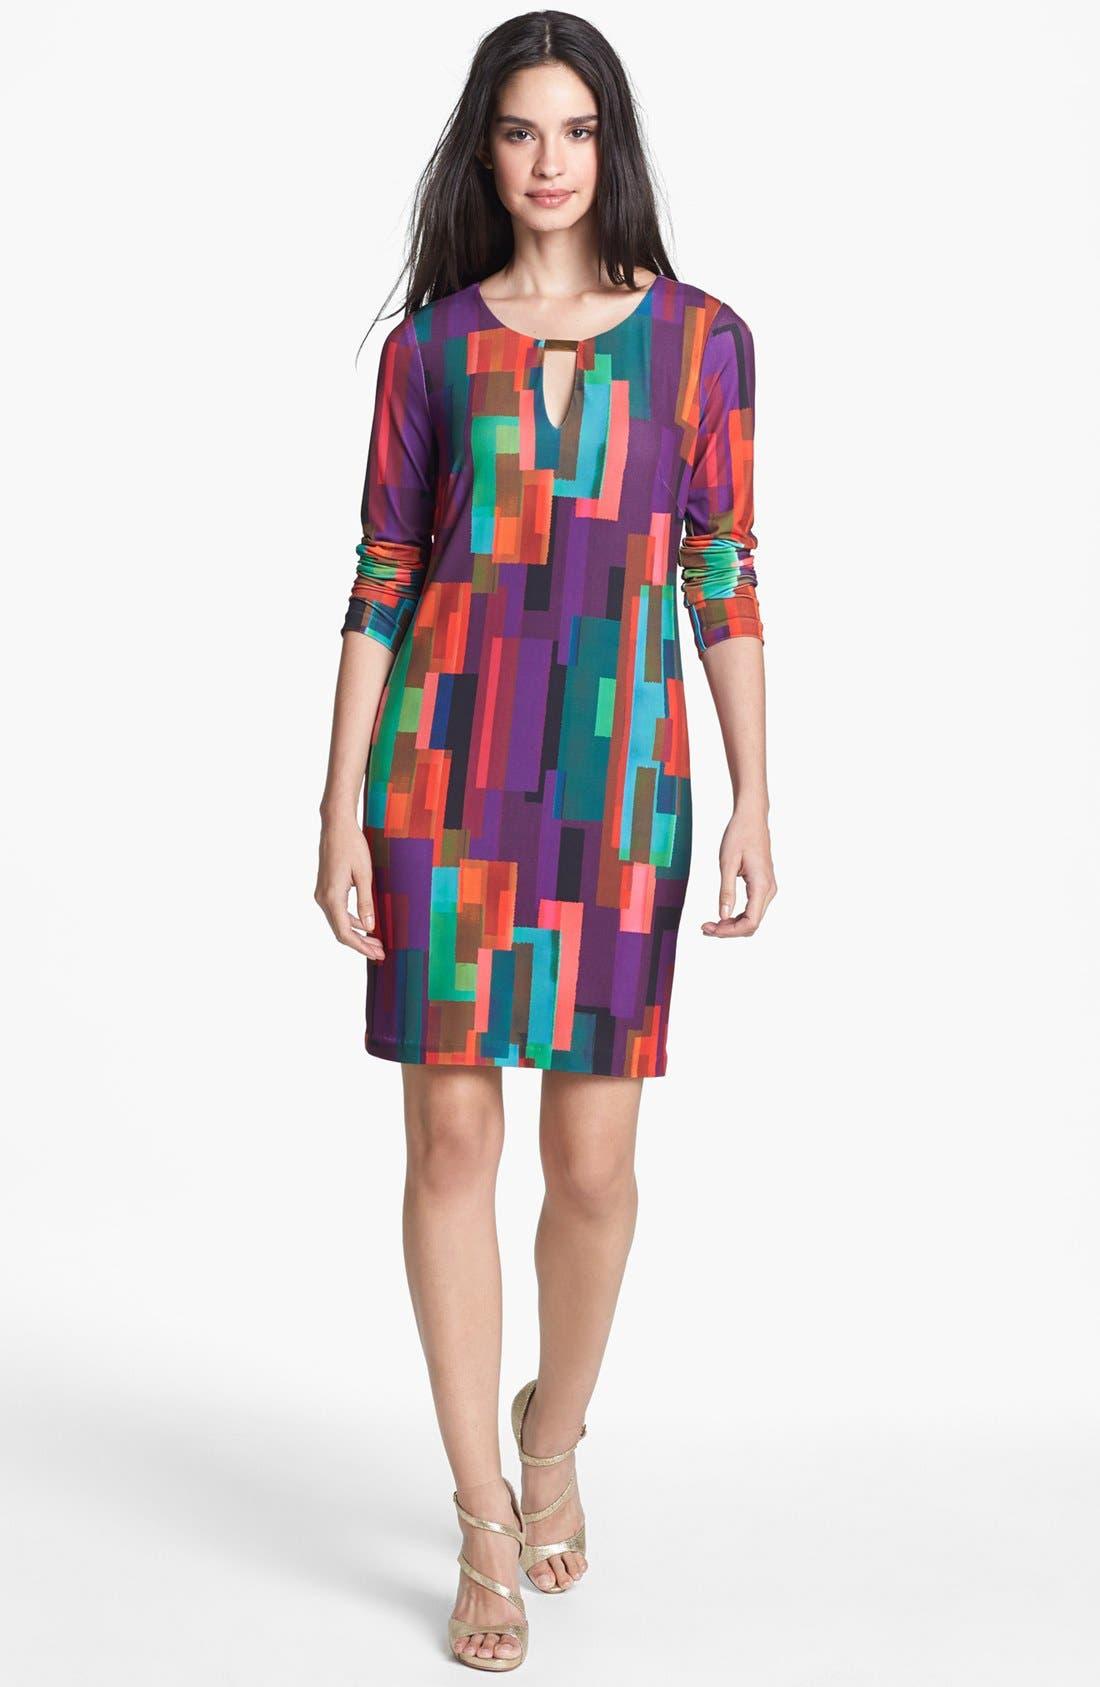 Alternate Image 1 Selected - Trina Turk 'Neva' Print Jersey Shift Dress